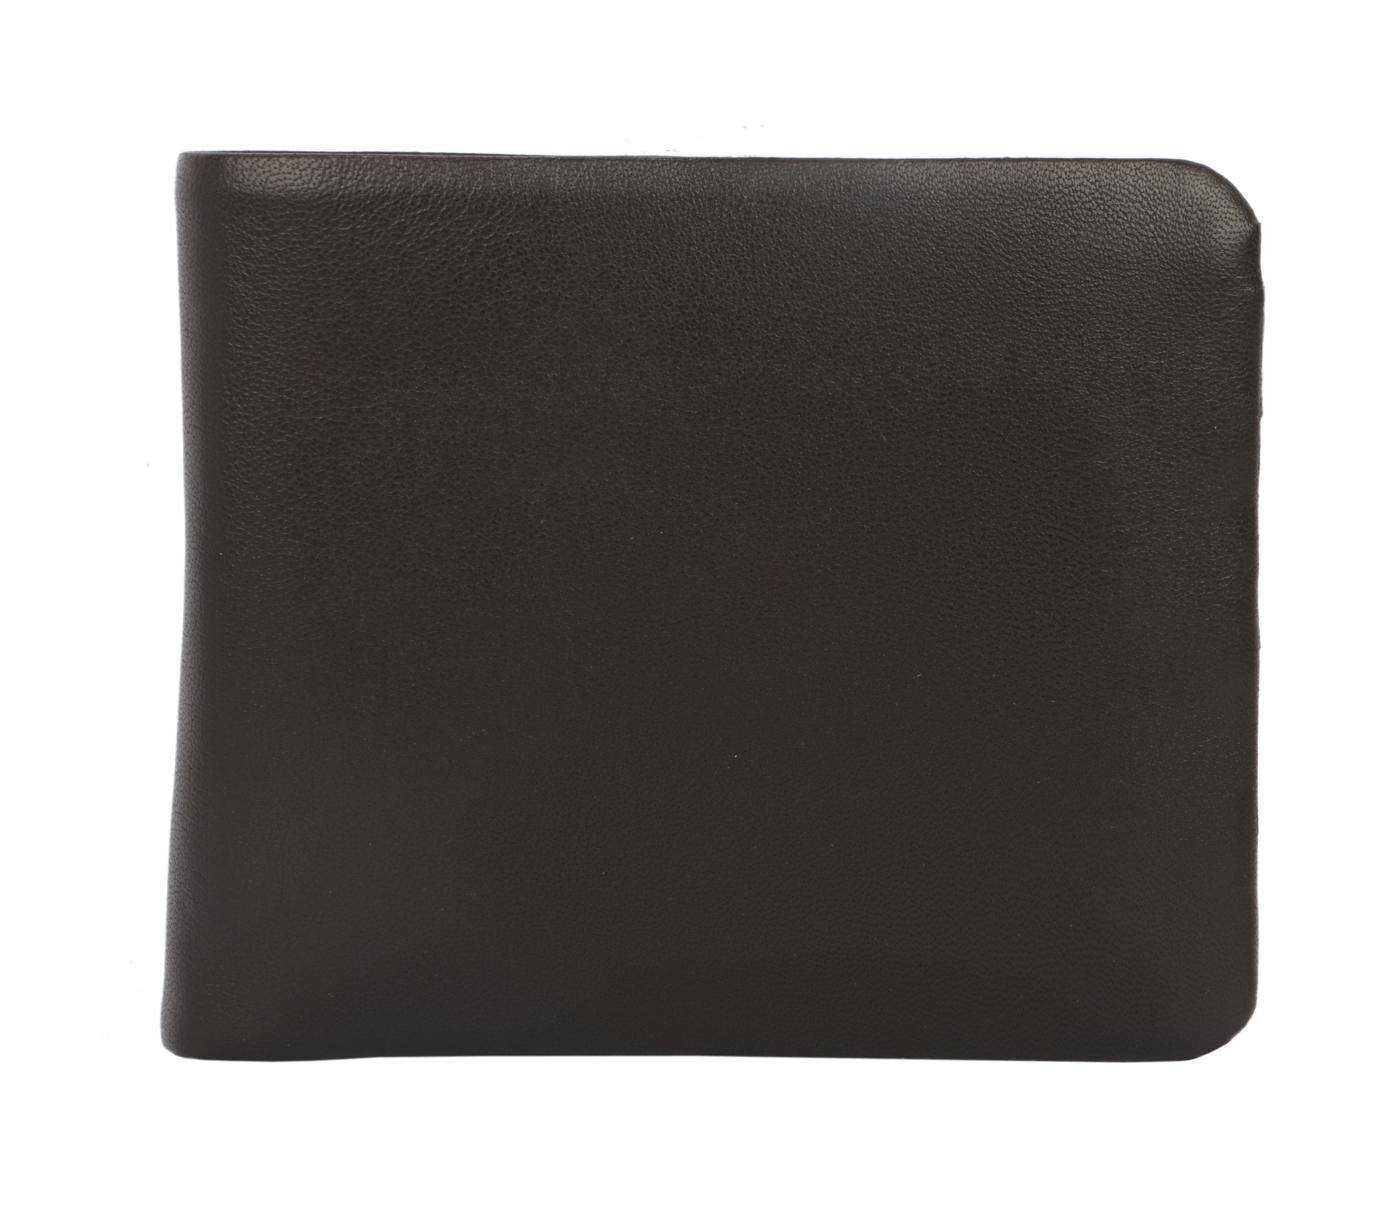 Almeda Leather Wallet(Brown)VW3